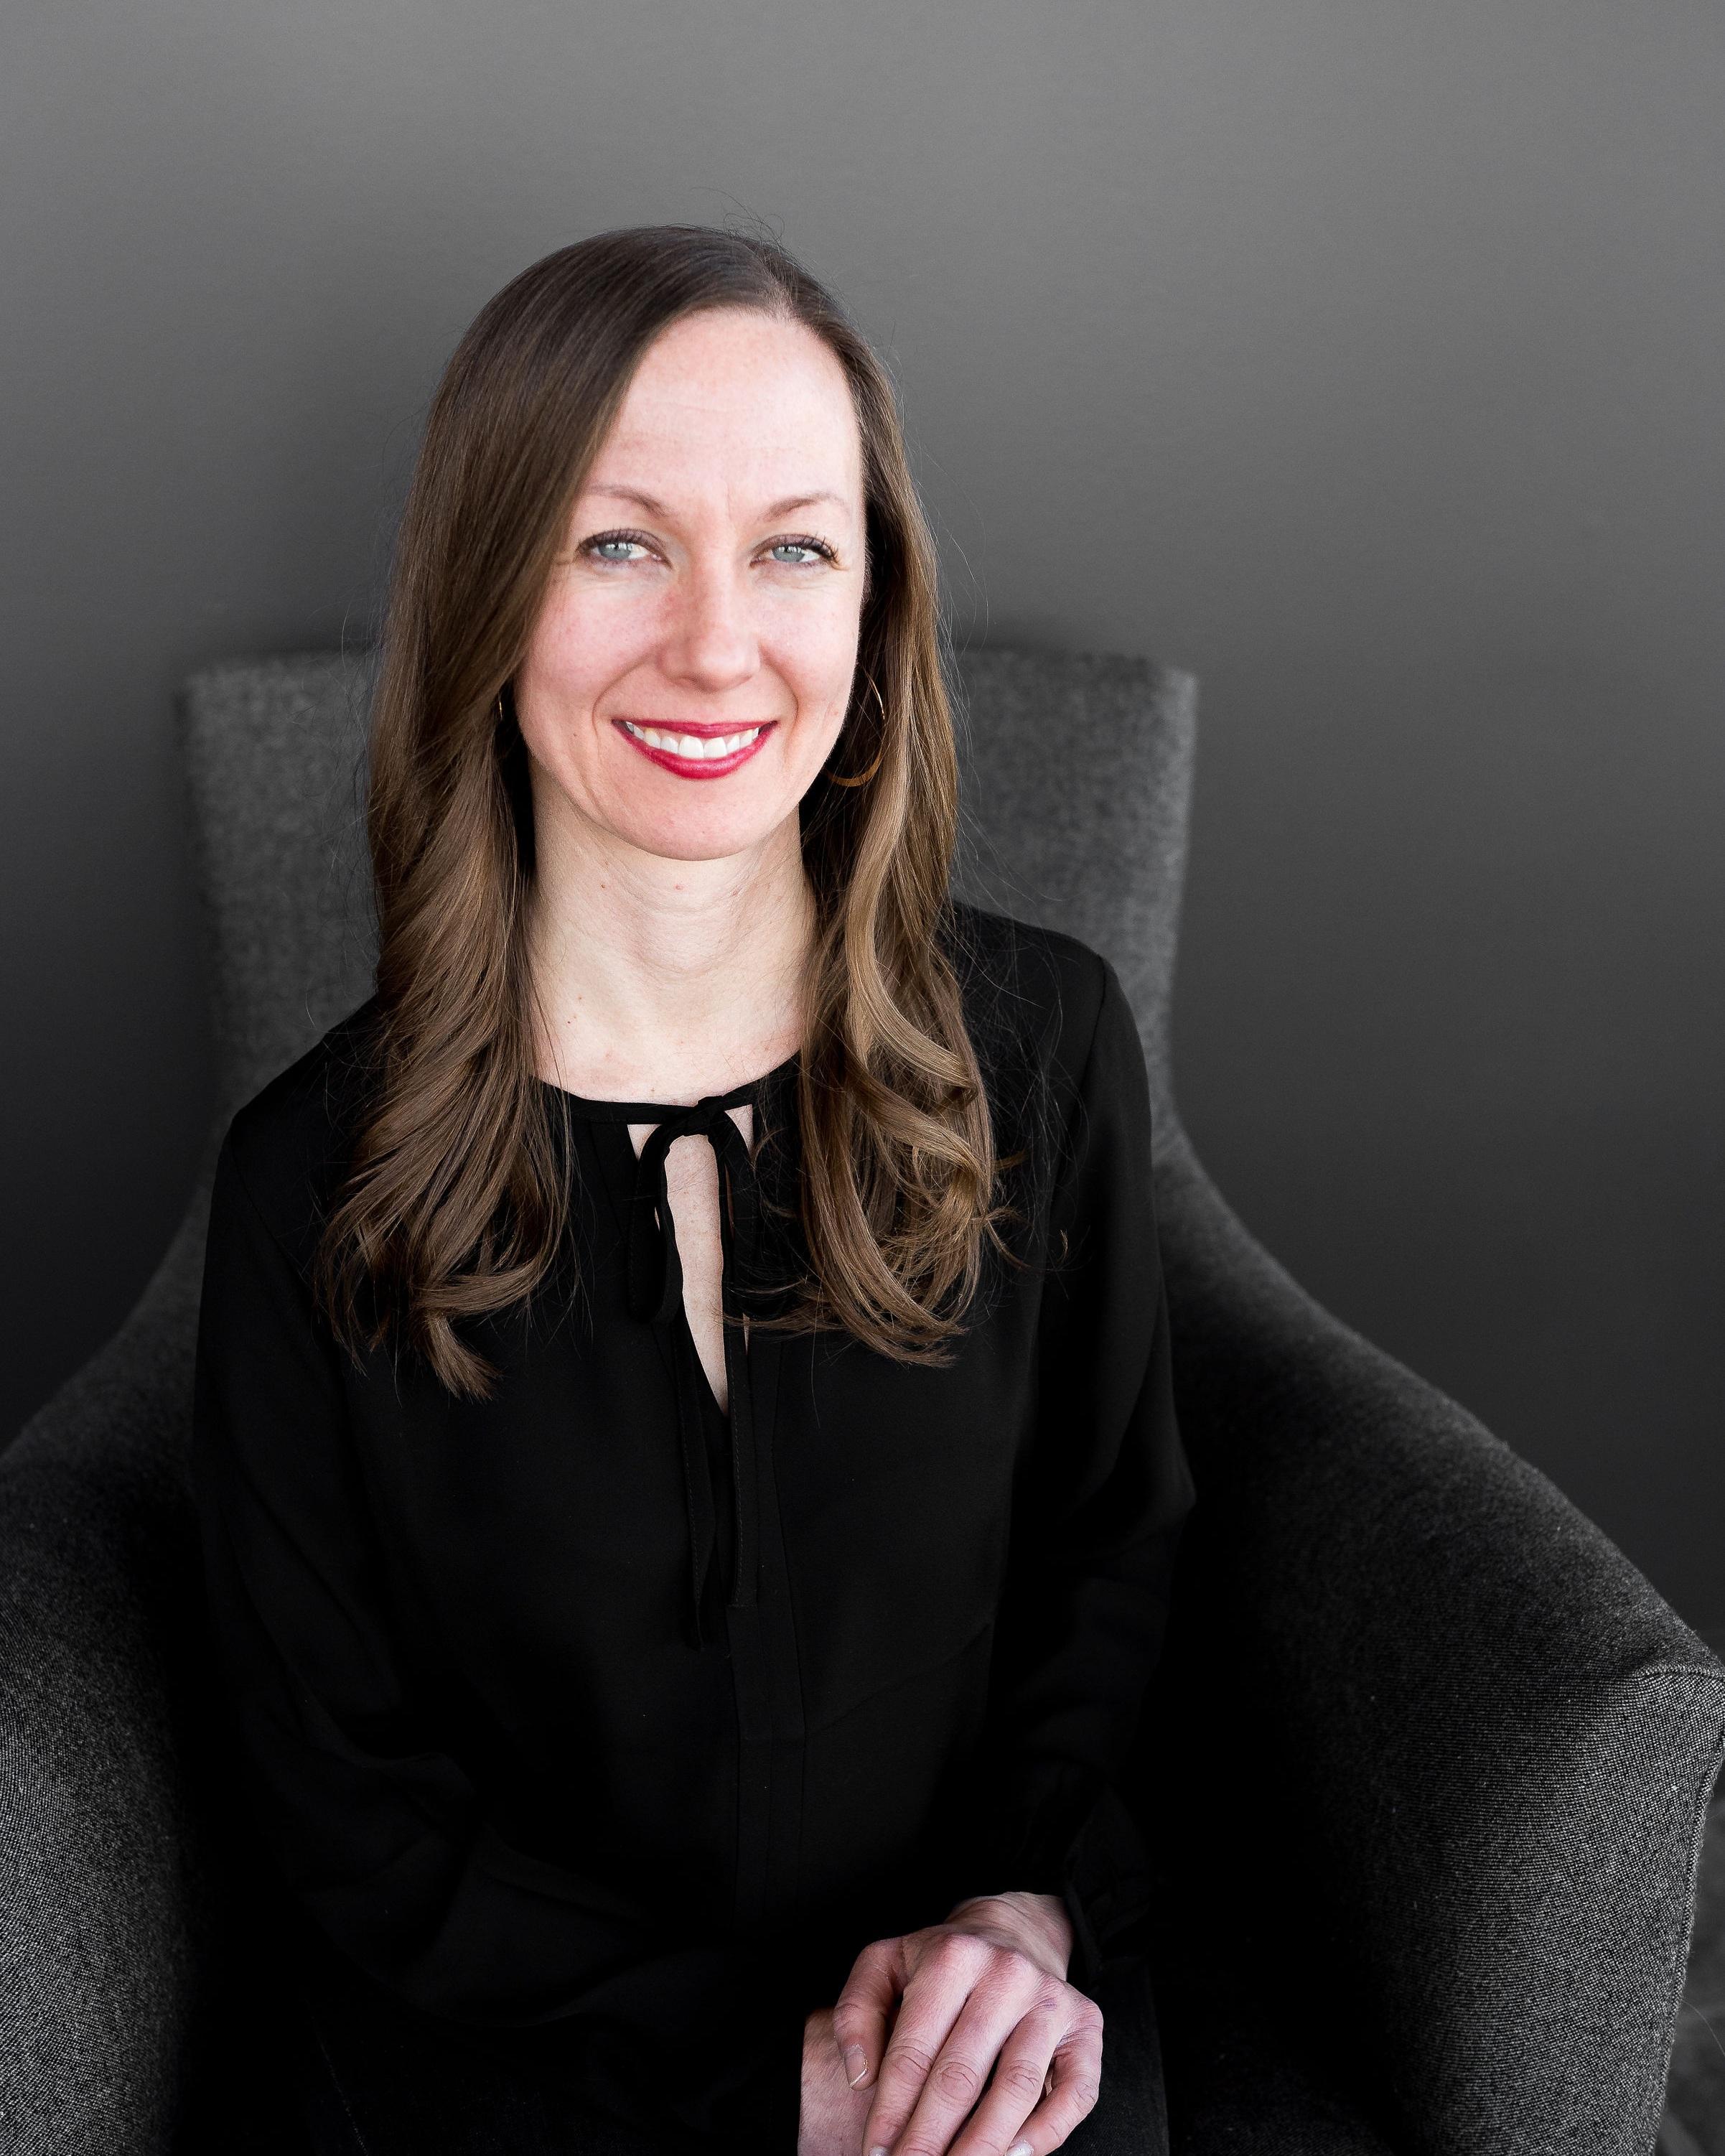 Jennifer Zoellner - DESIGNER